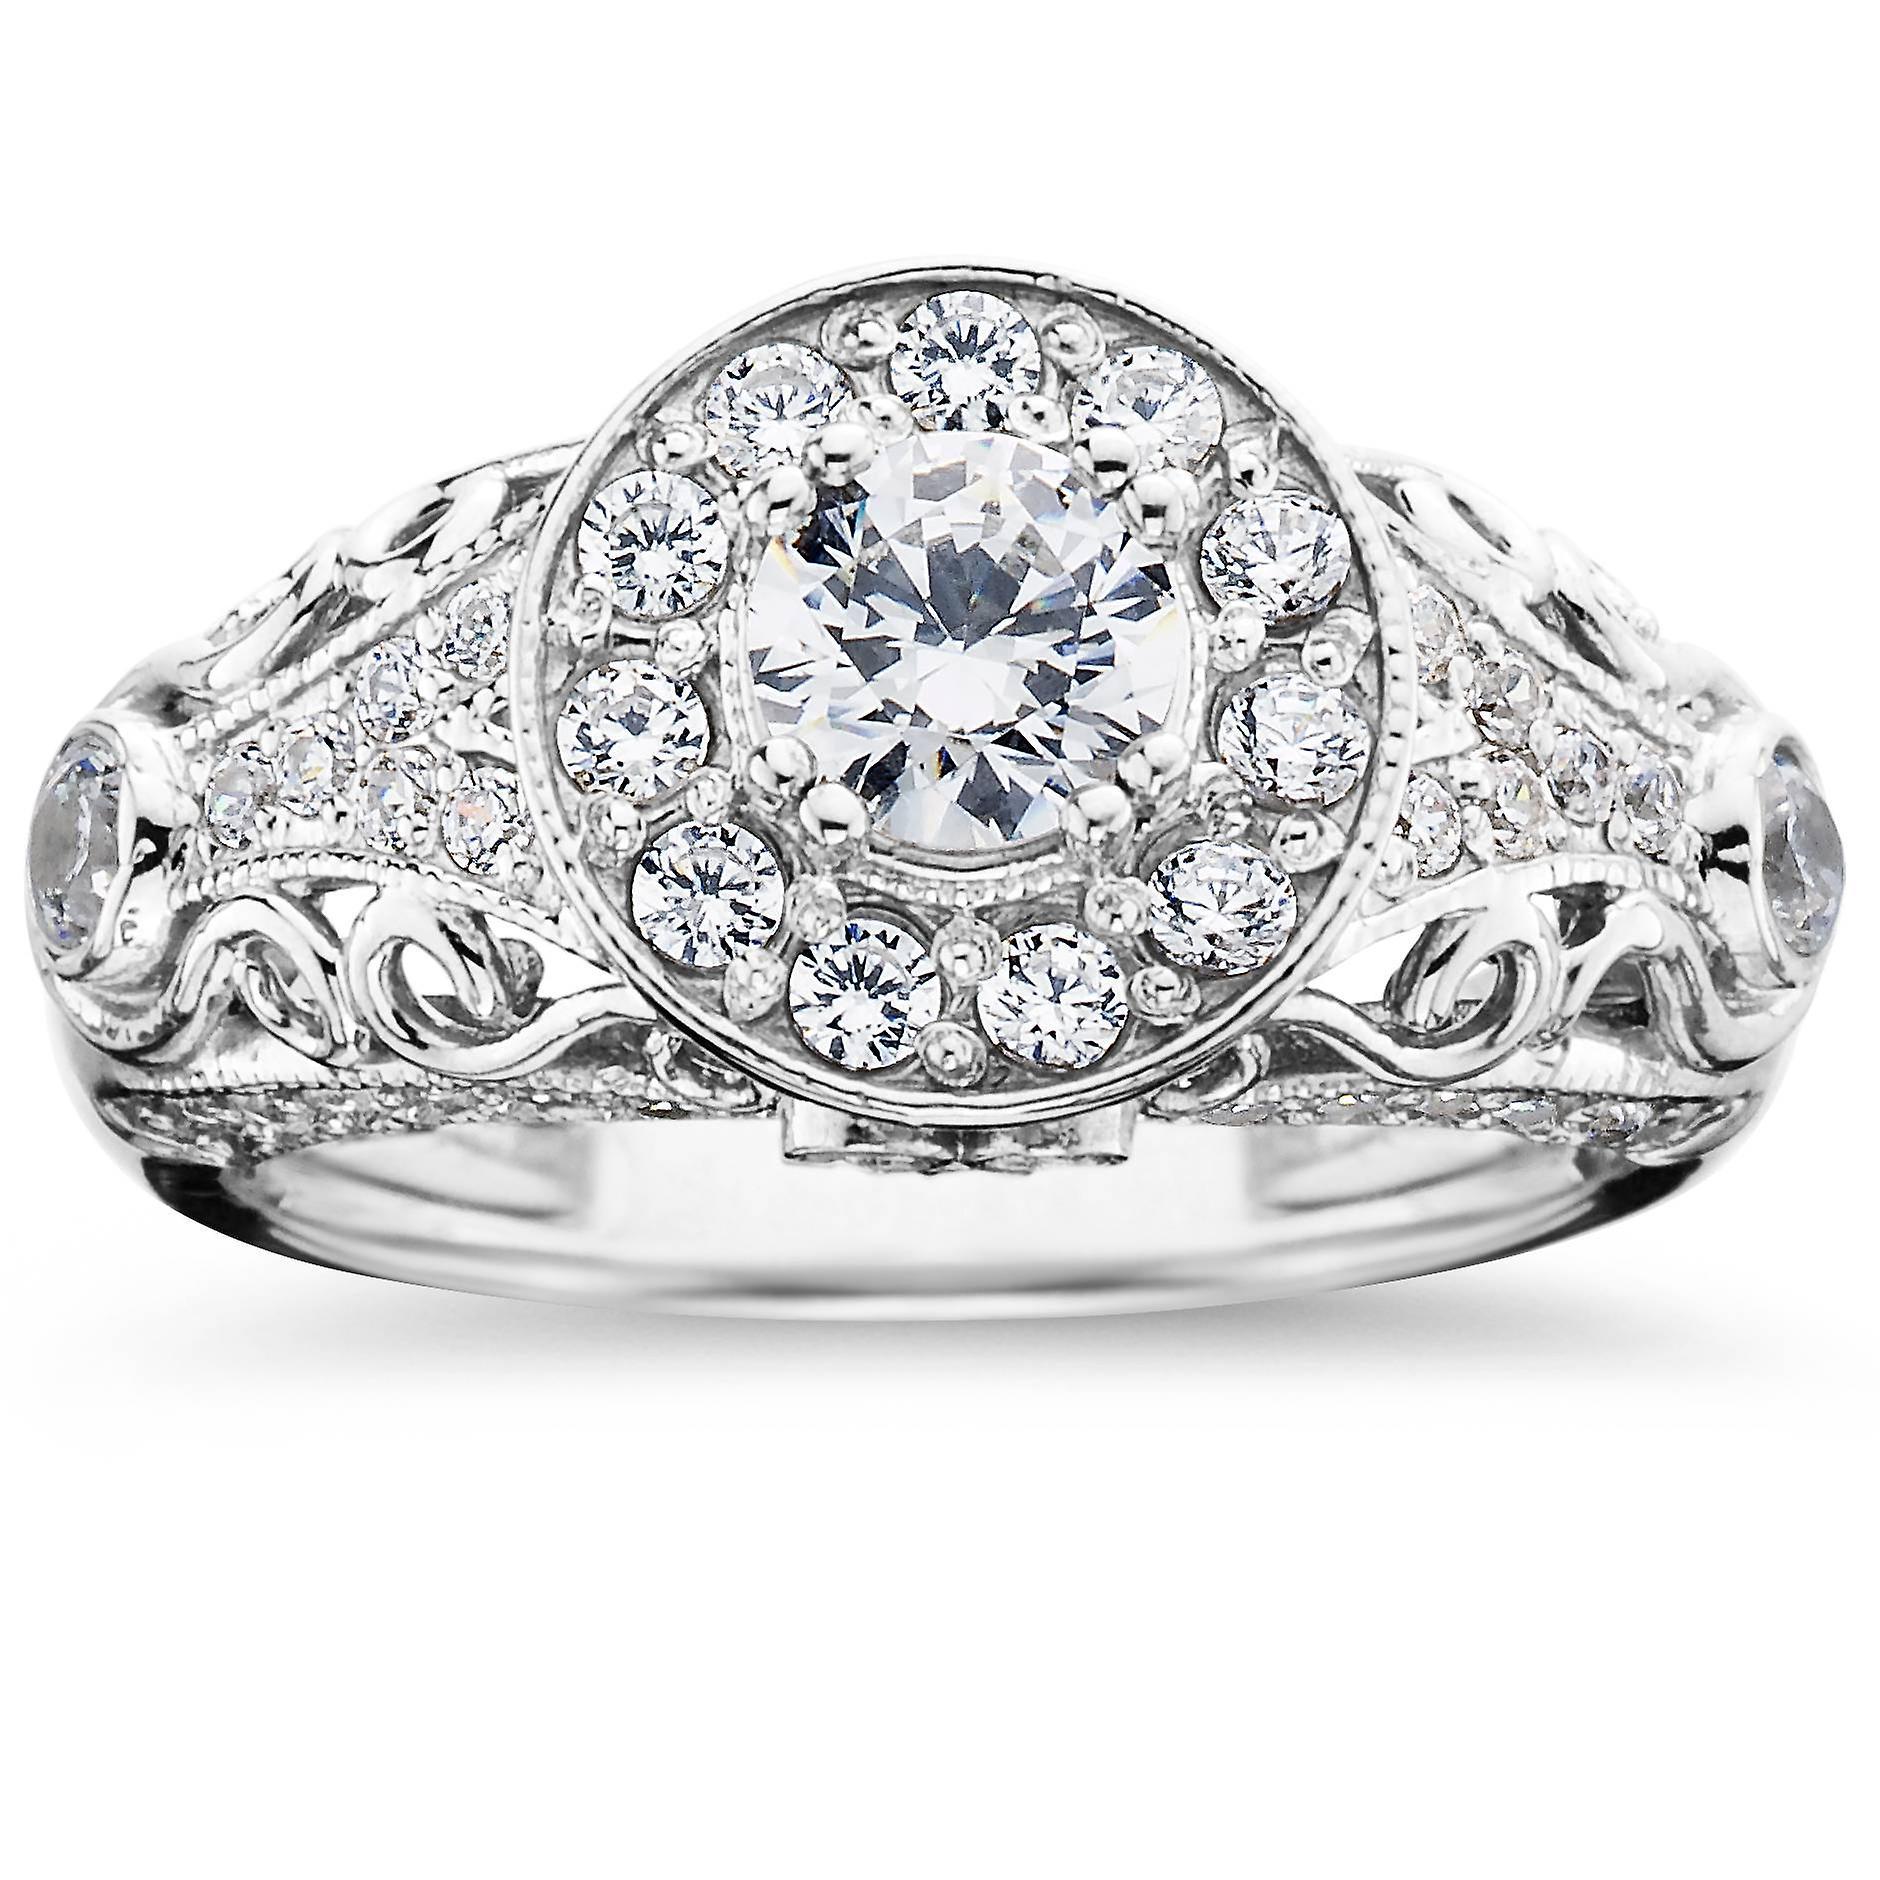 1 1/2ct Vintage Diamond Engagement Ring 14K White Gold